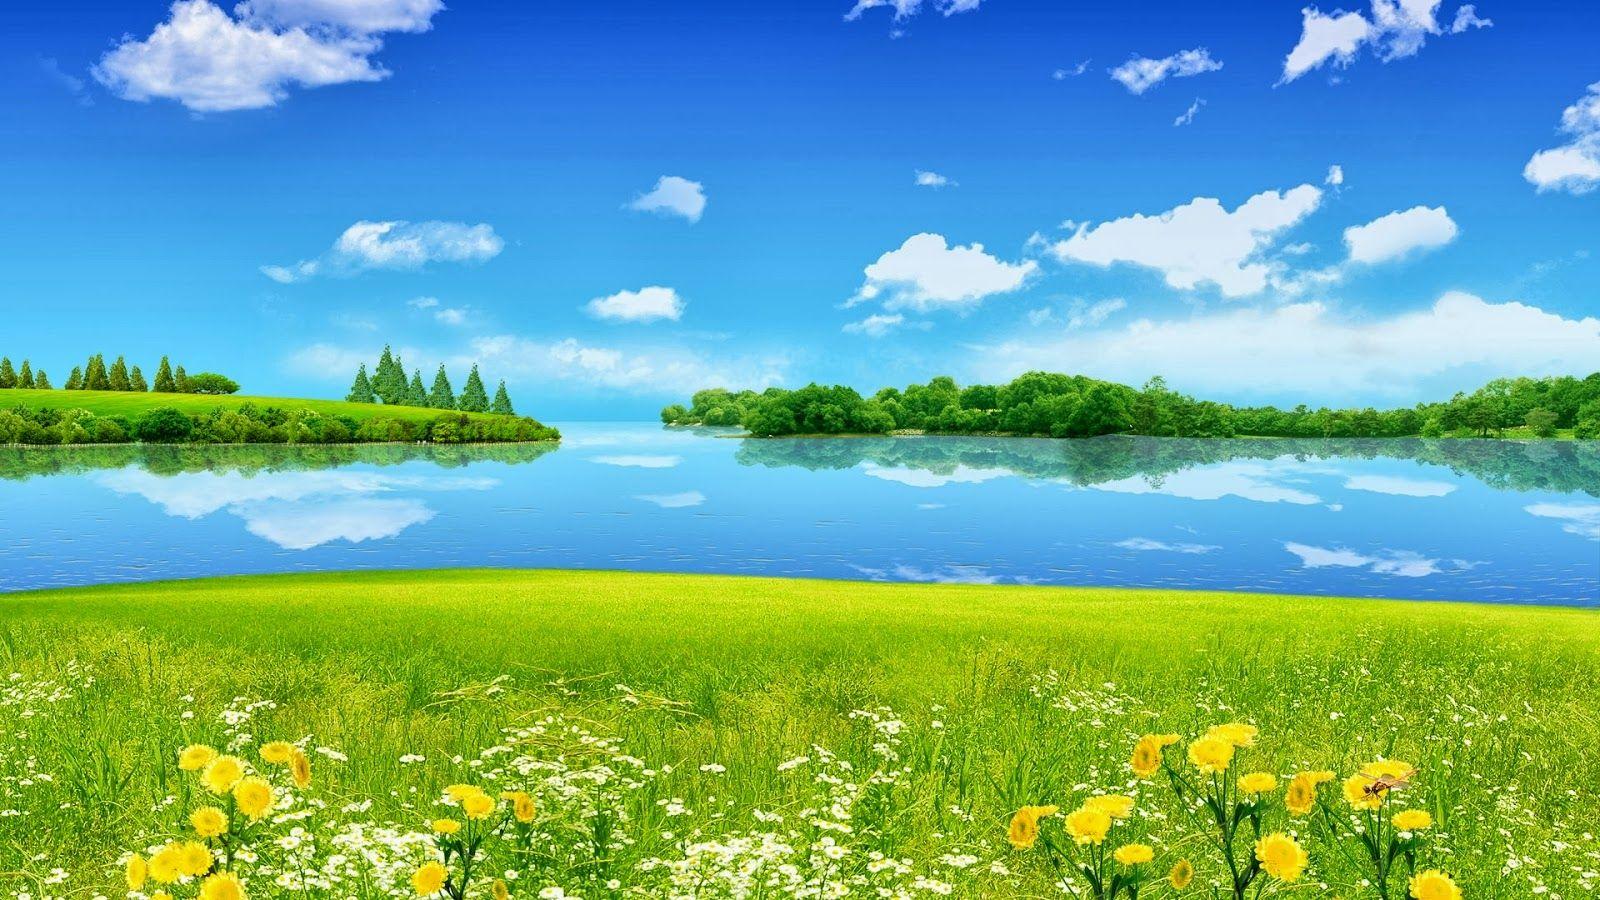 Full HD Wallpaper Download : Find best latest Full HD Wallpaper Download in HD for your PC ...